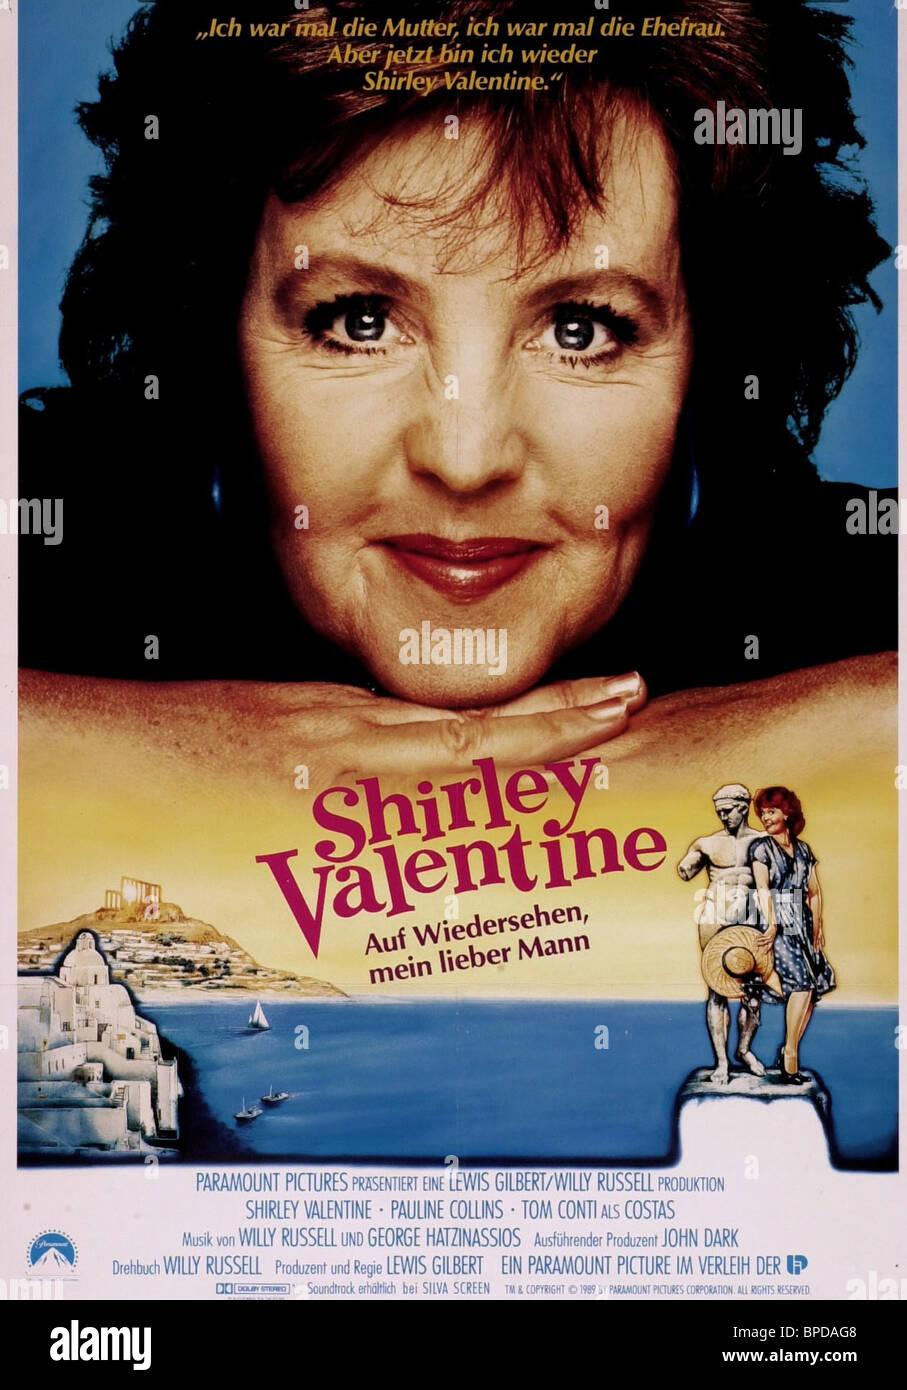 pauline collins poster shirley valentine 1989 stock photo